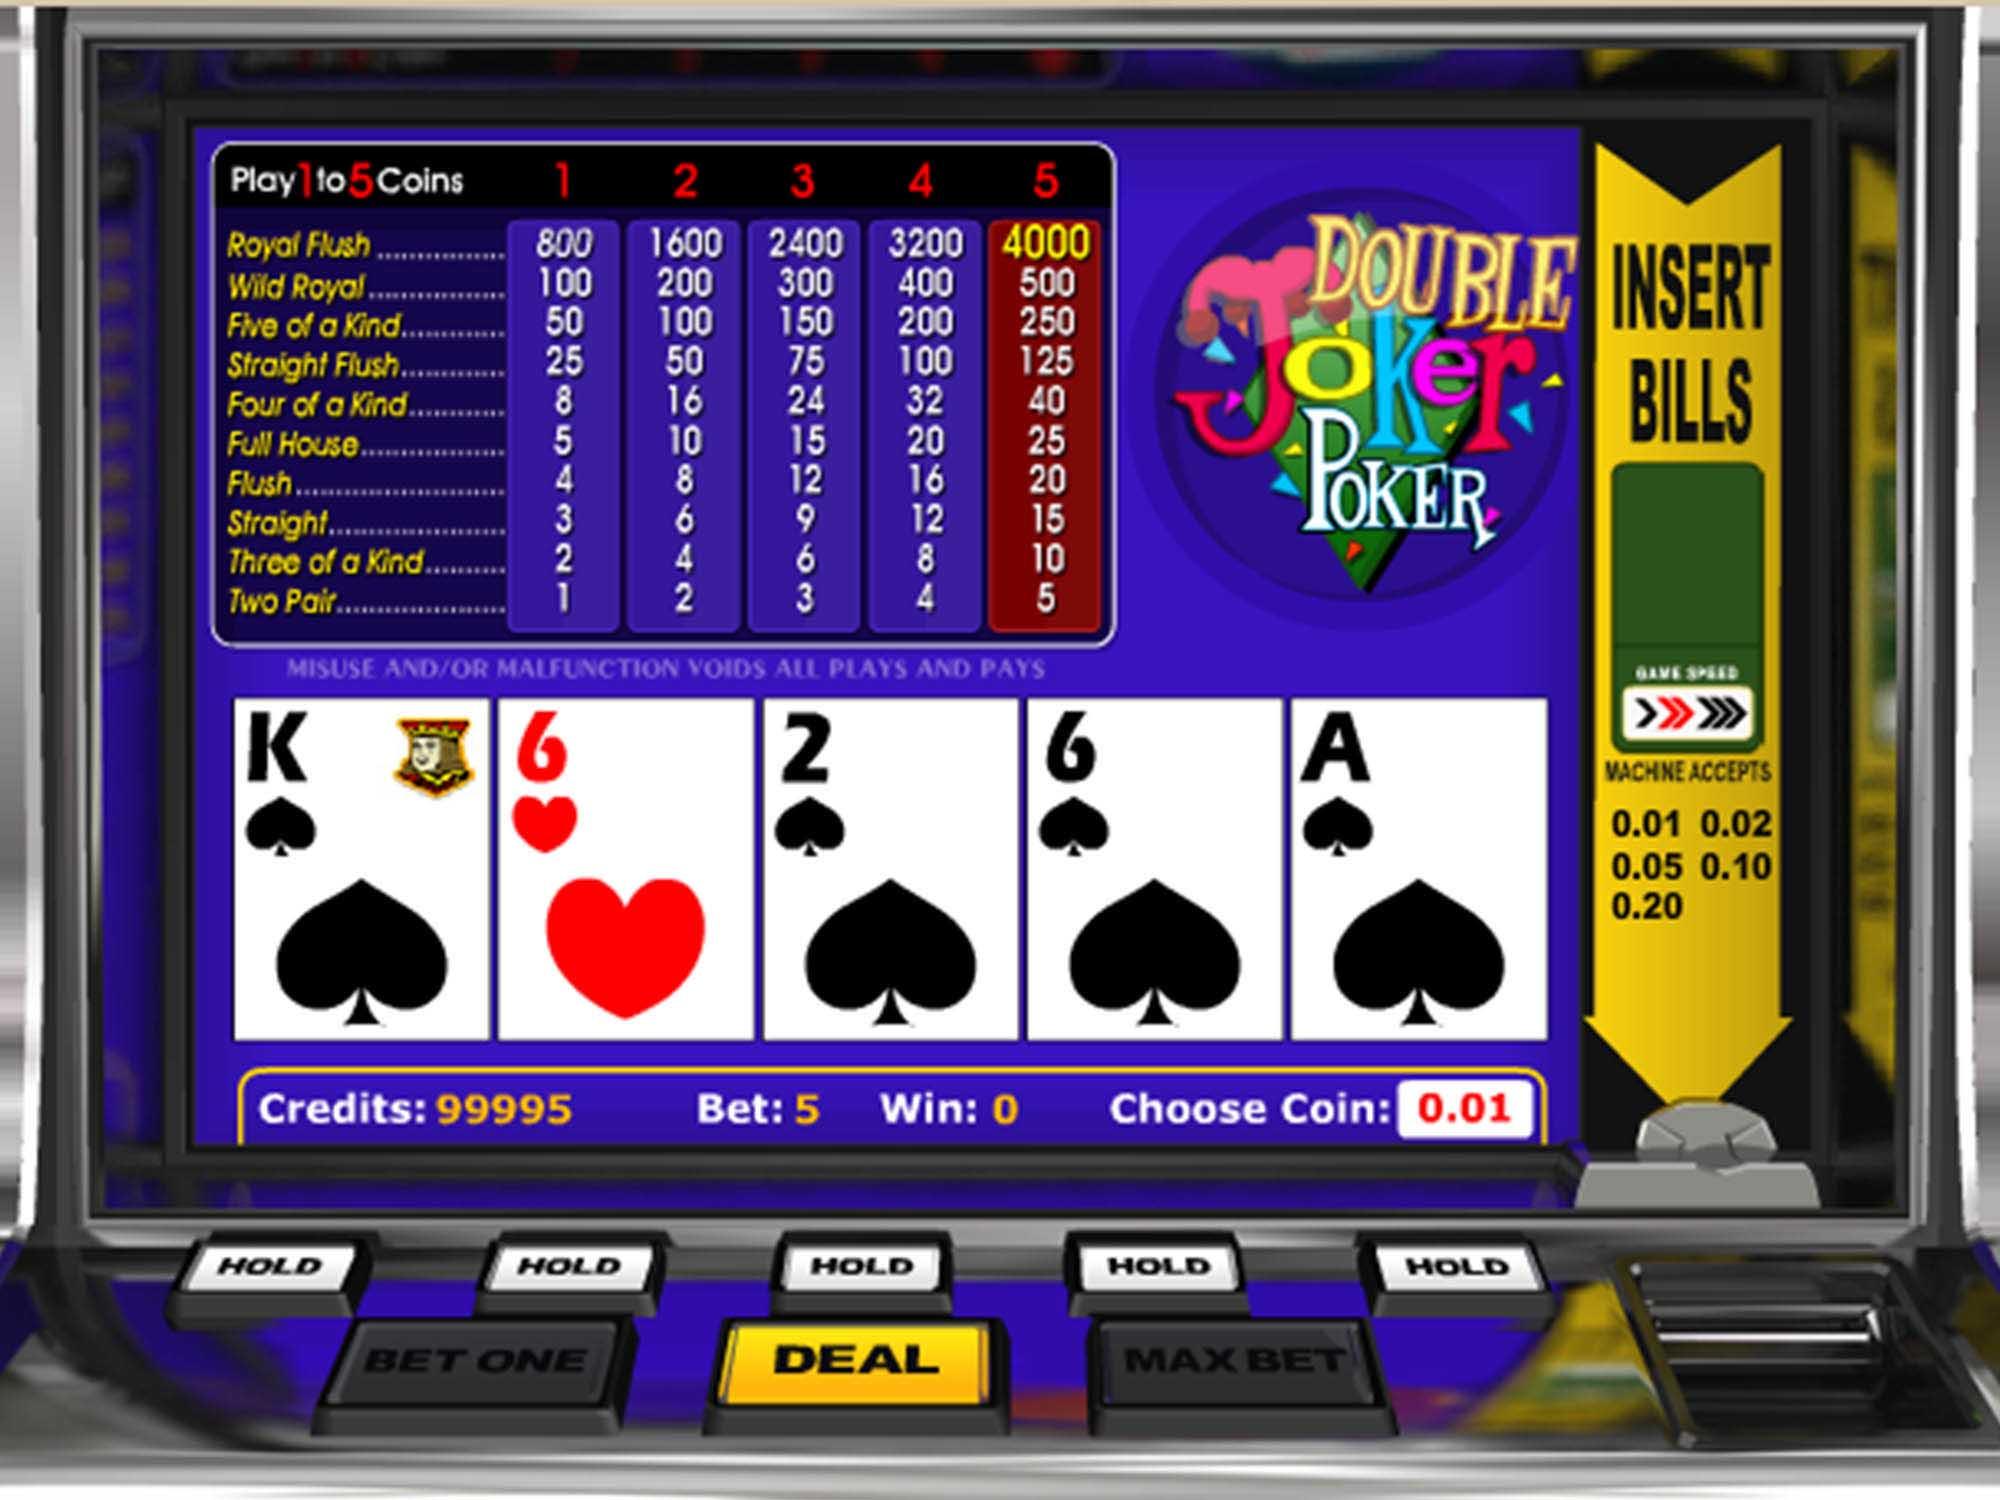 Double Joker Poker screenshot